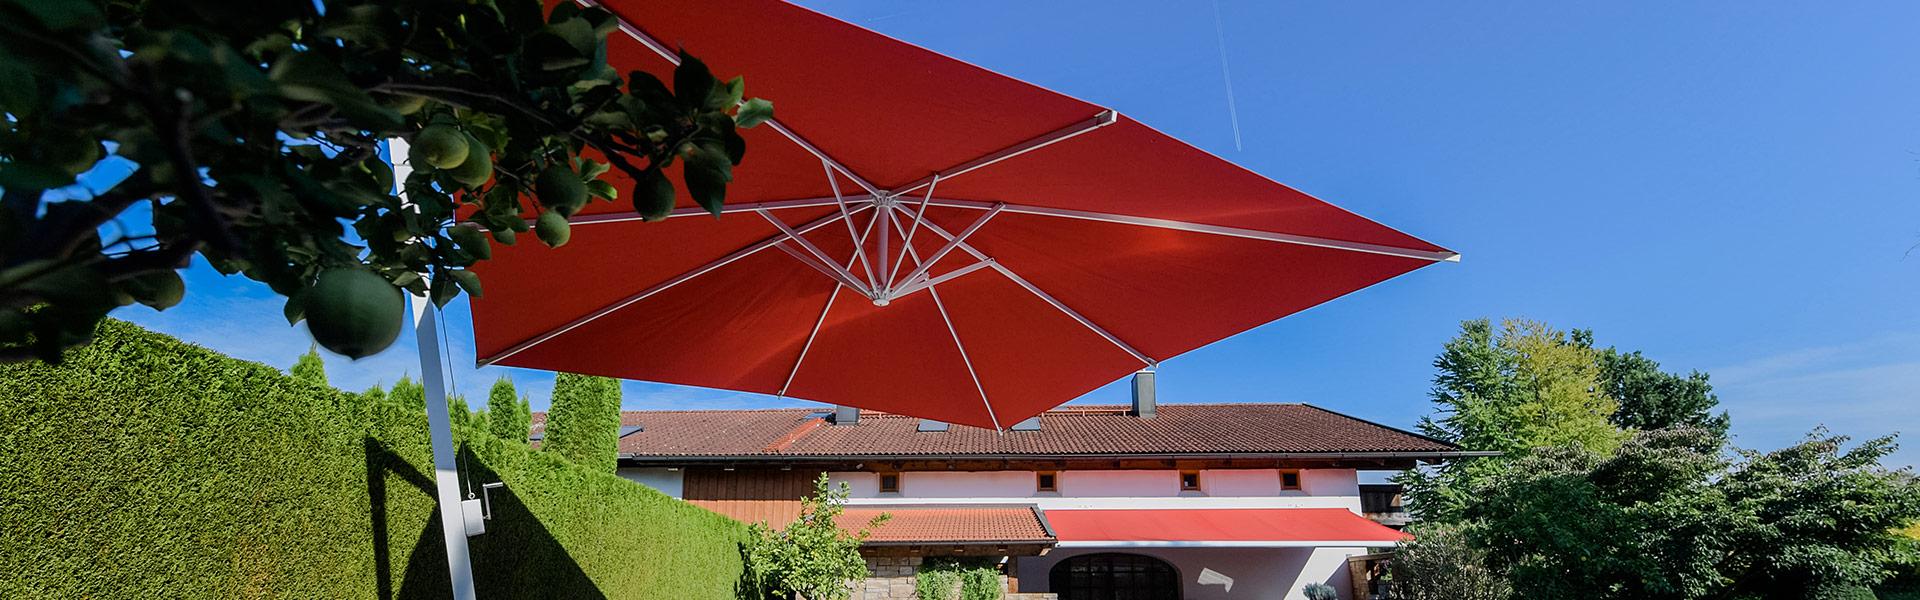 Huber Mein Lebensgefühl Garten Terrasse Balkon Sonnenschirme